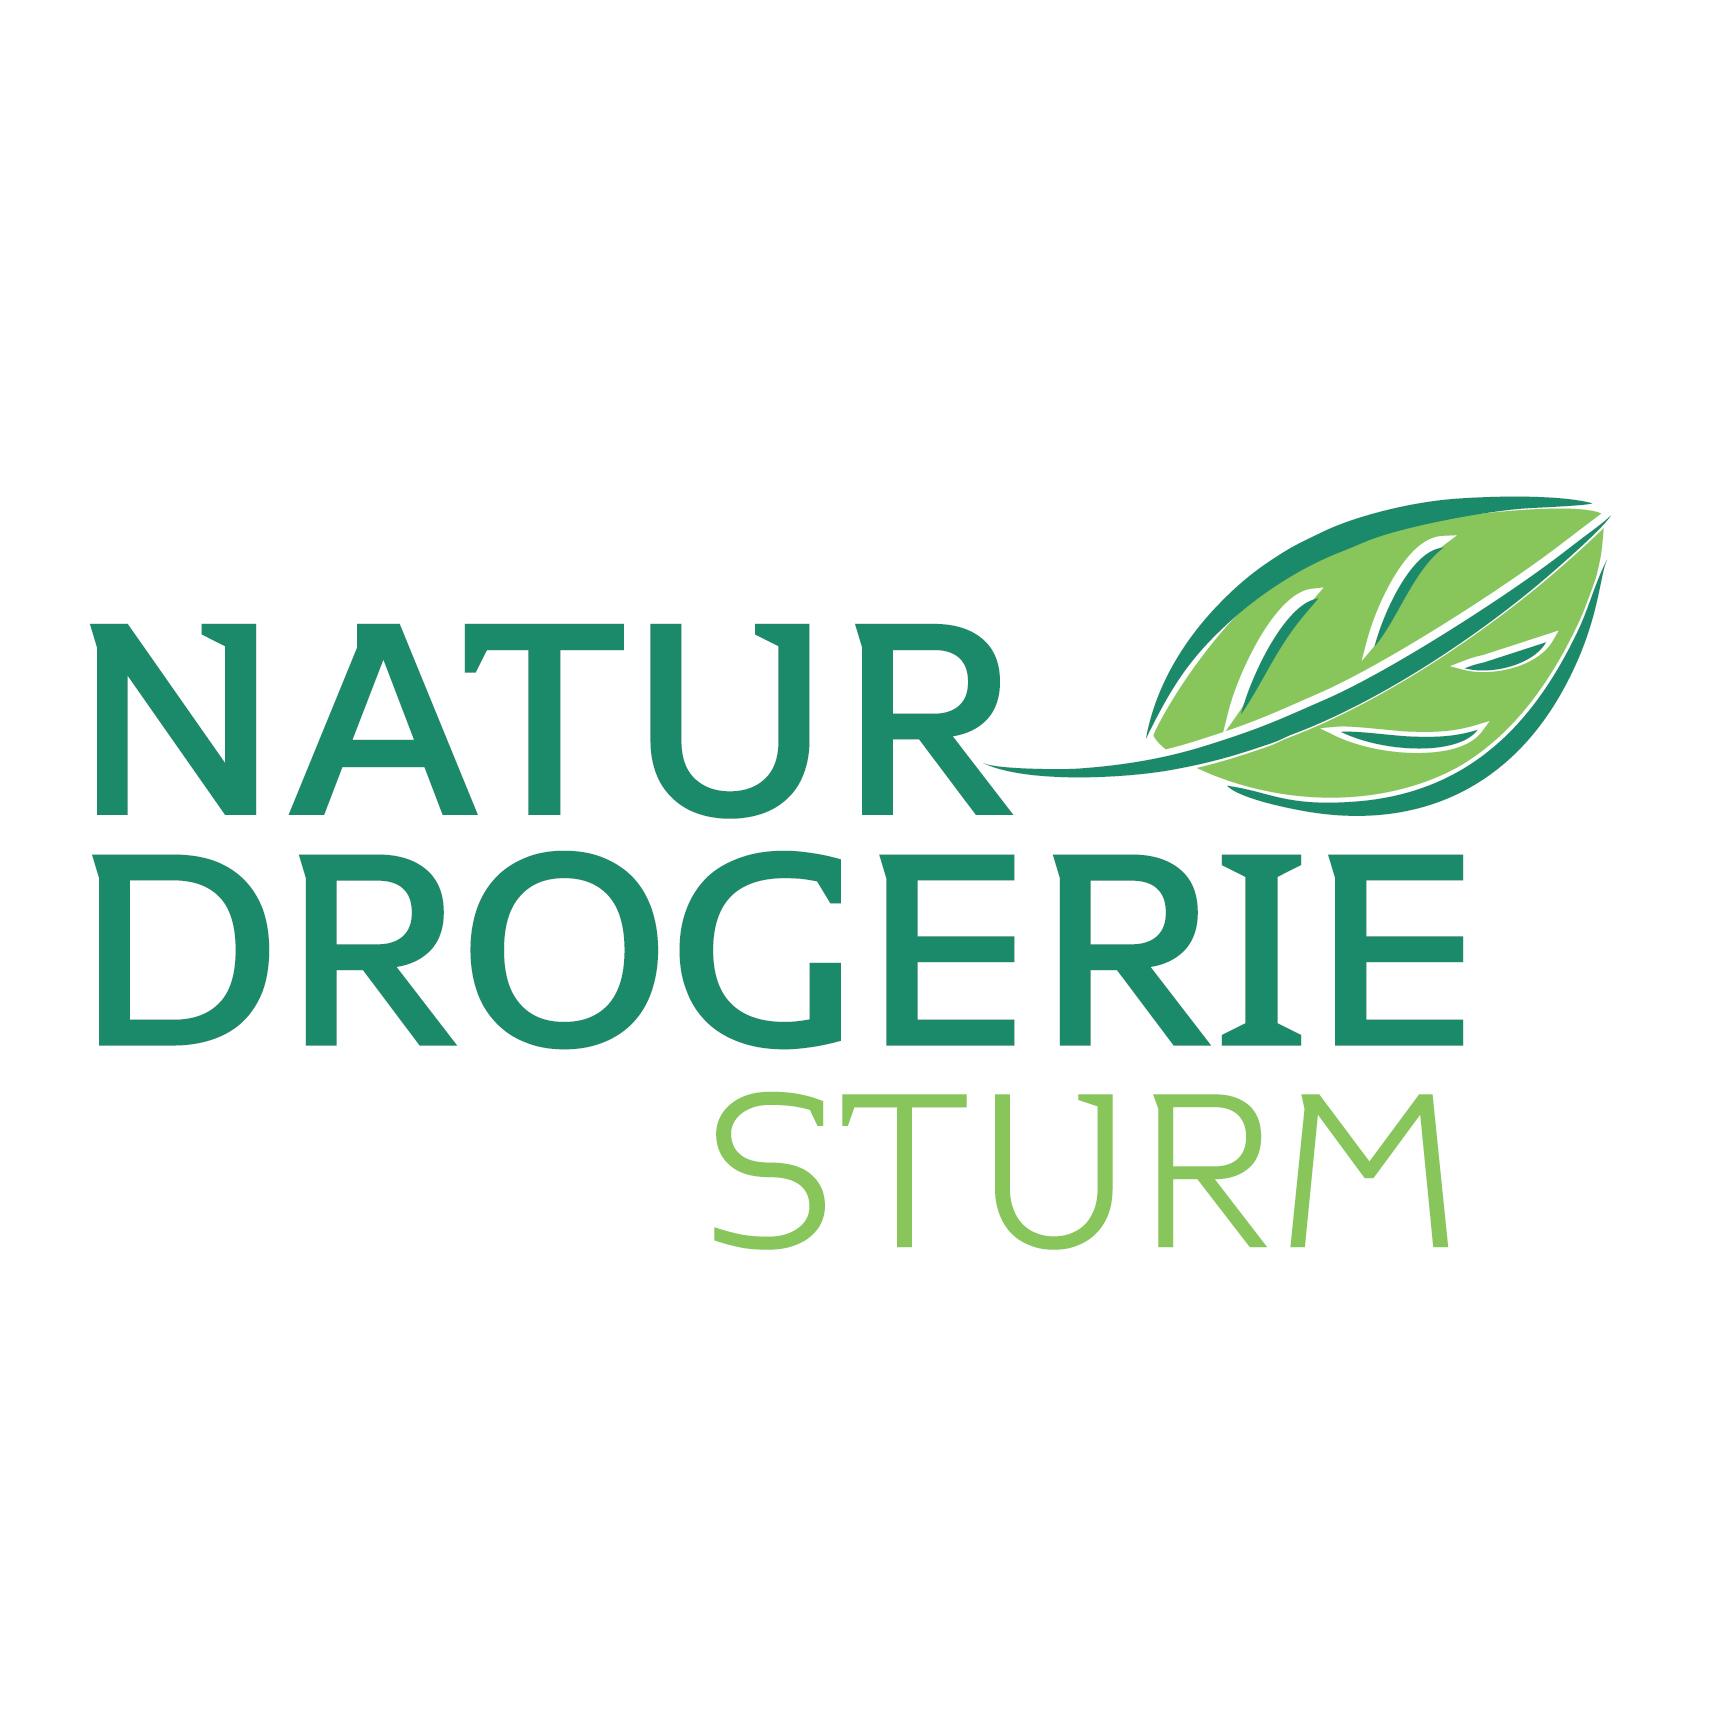 Naturdrogerie Sturm